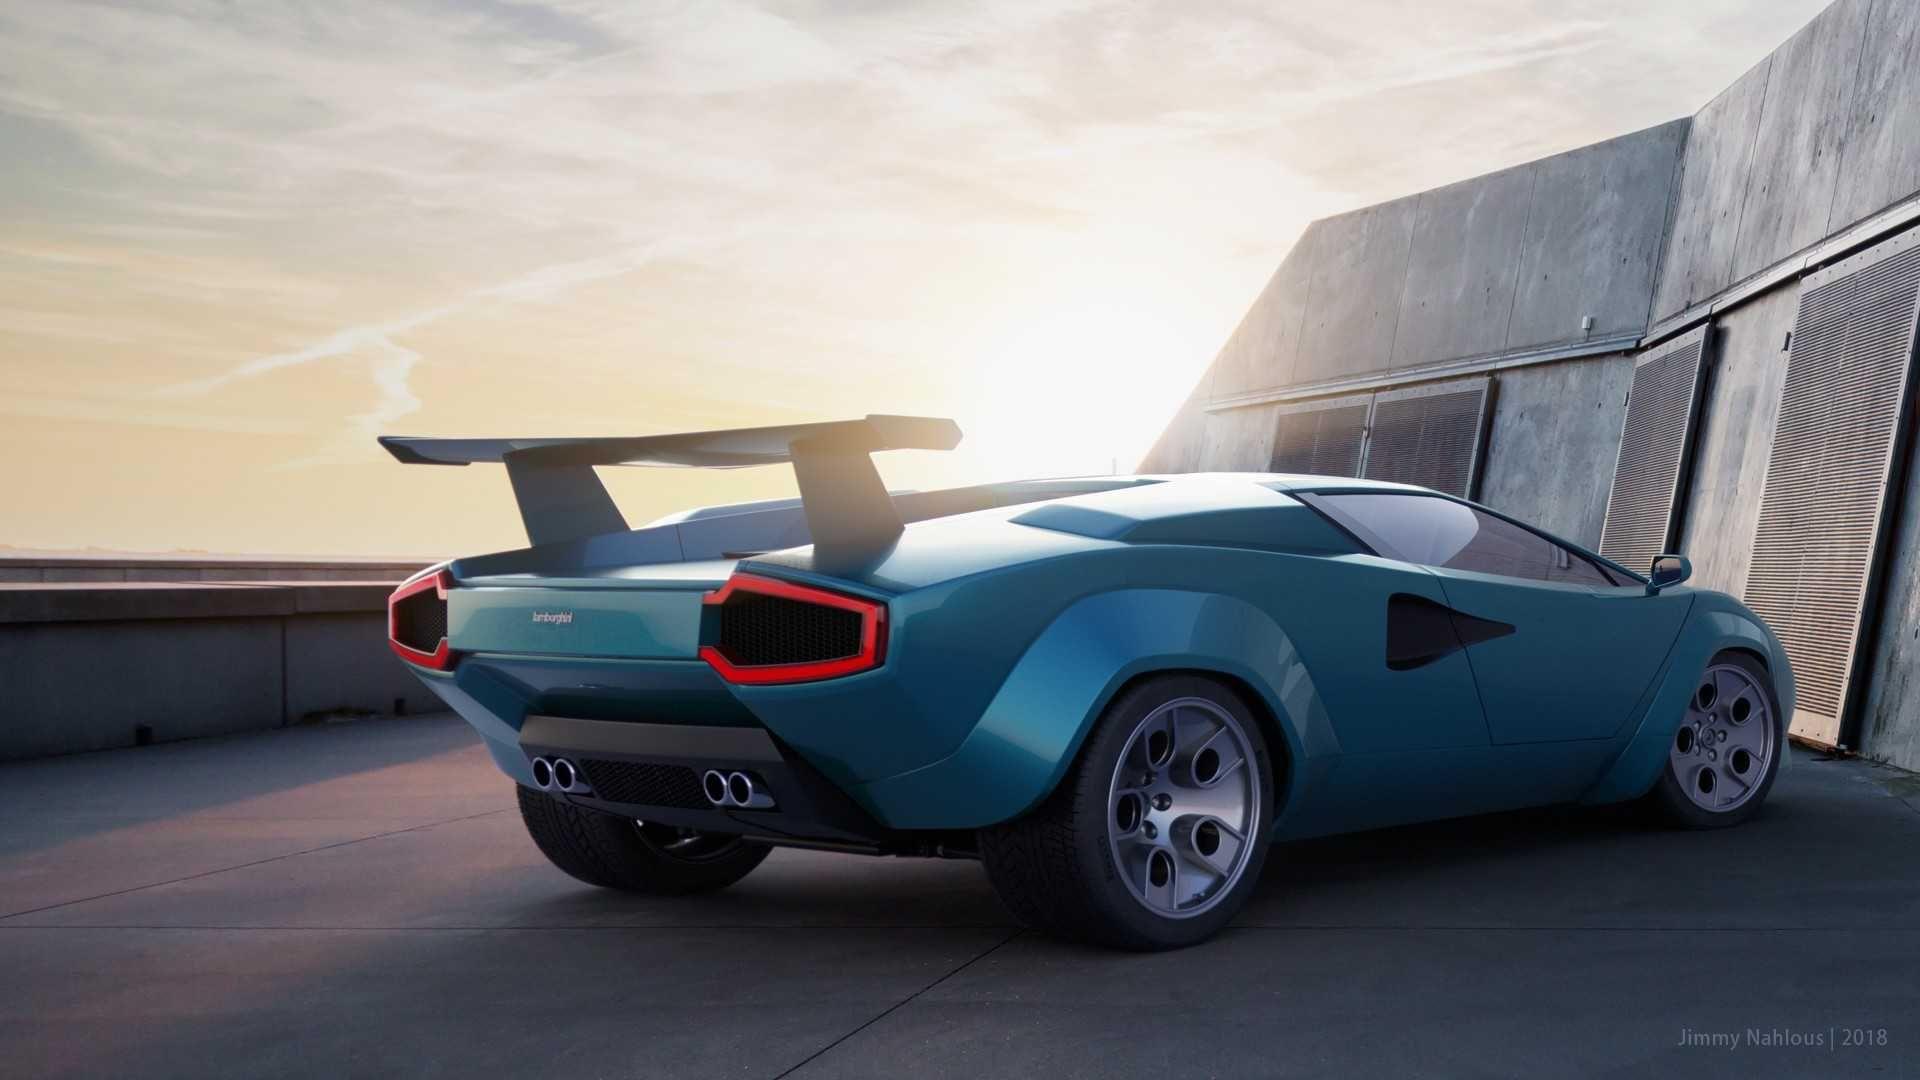 Lamborghini Countach Concept EV | Lamborghini cars